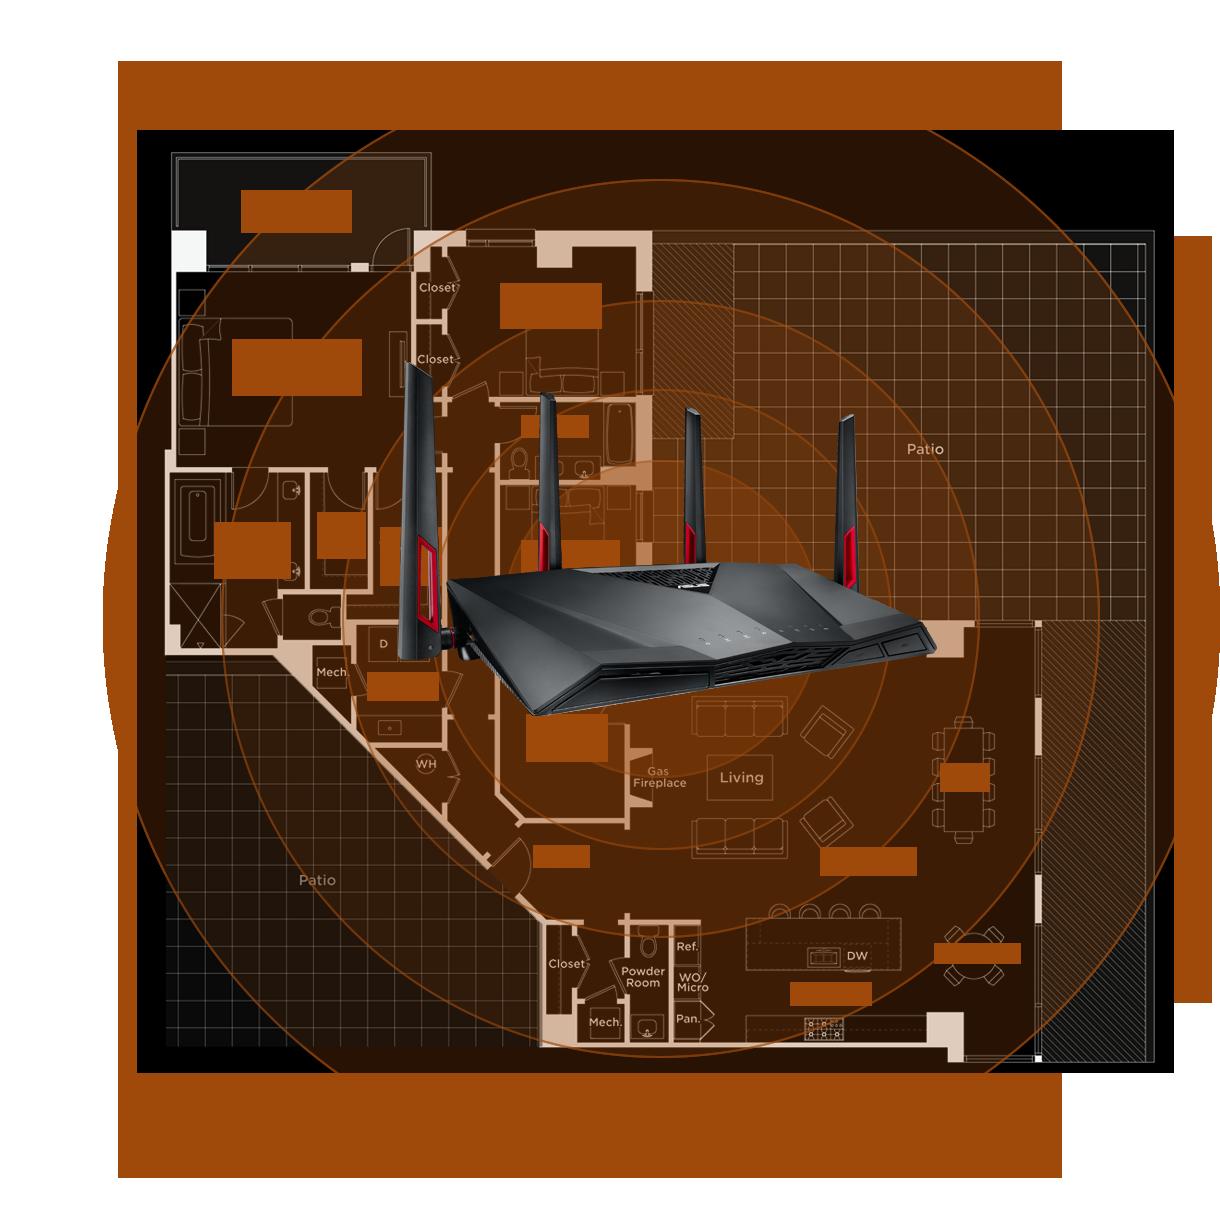 Rt Ac88u Networking Asus Usa Wireless Home Network Design Diagram